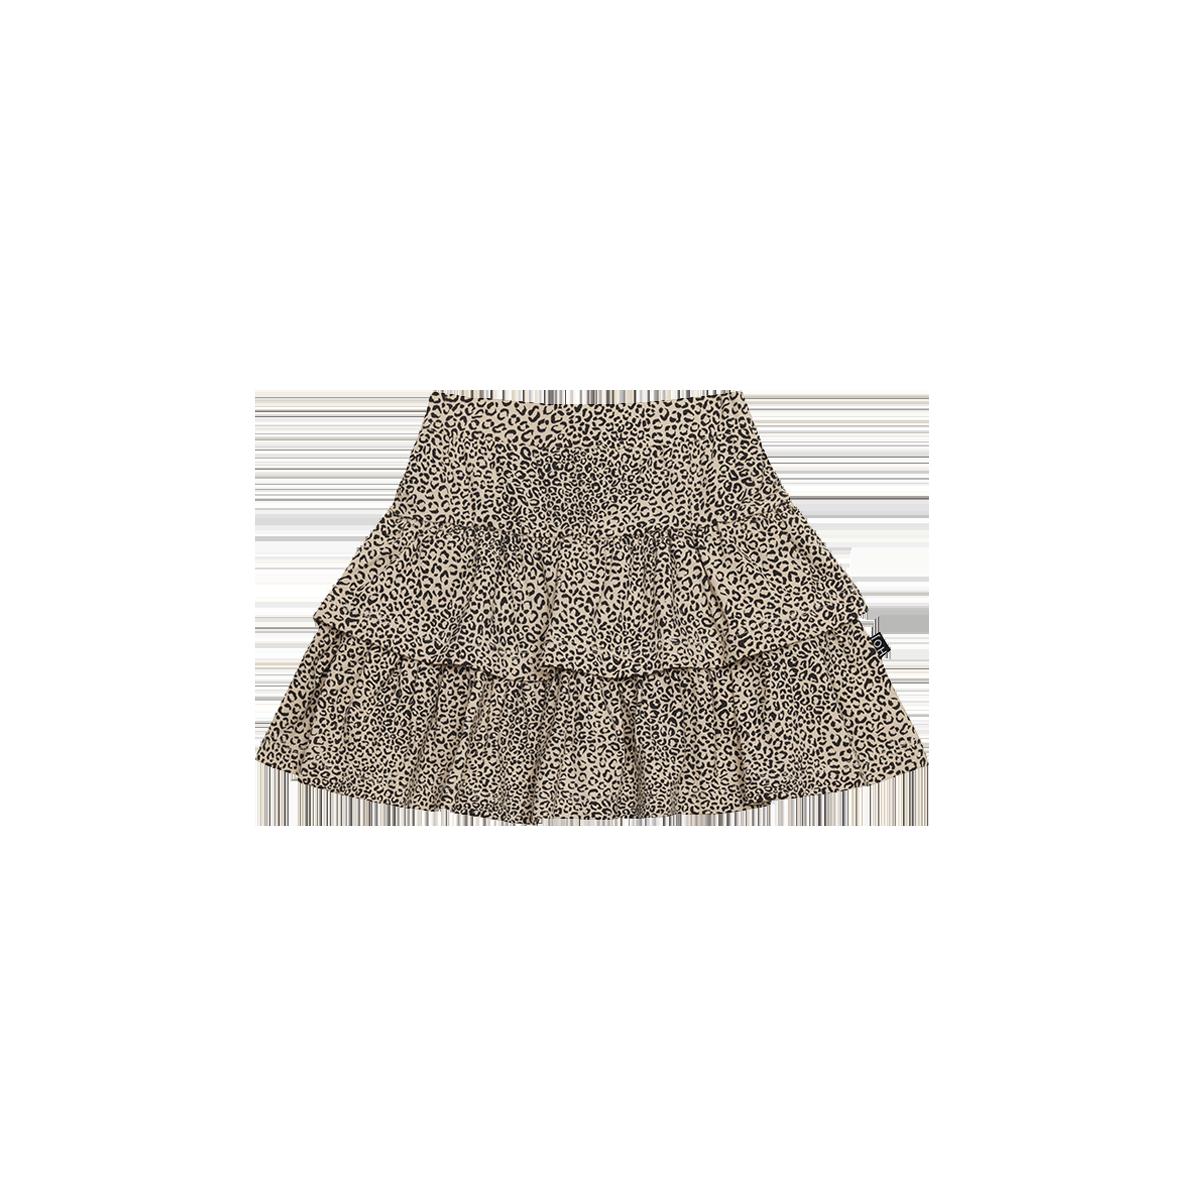 Ruffled Skirt HOJ Charcoal Little Leopard